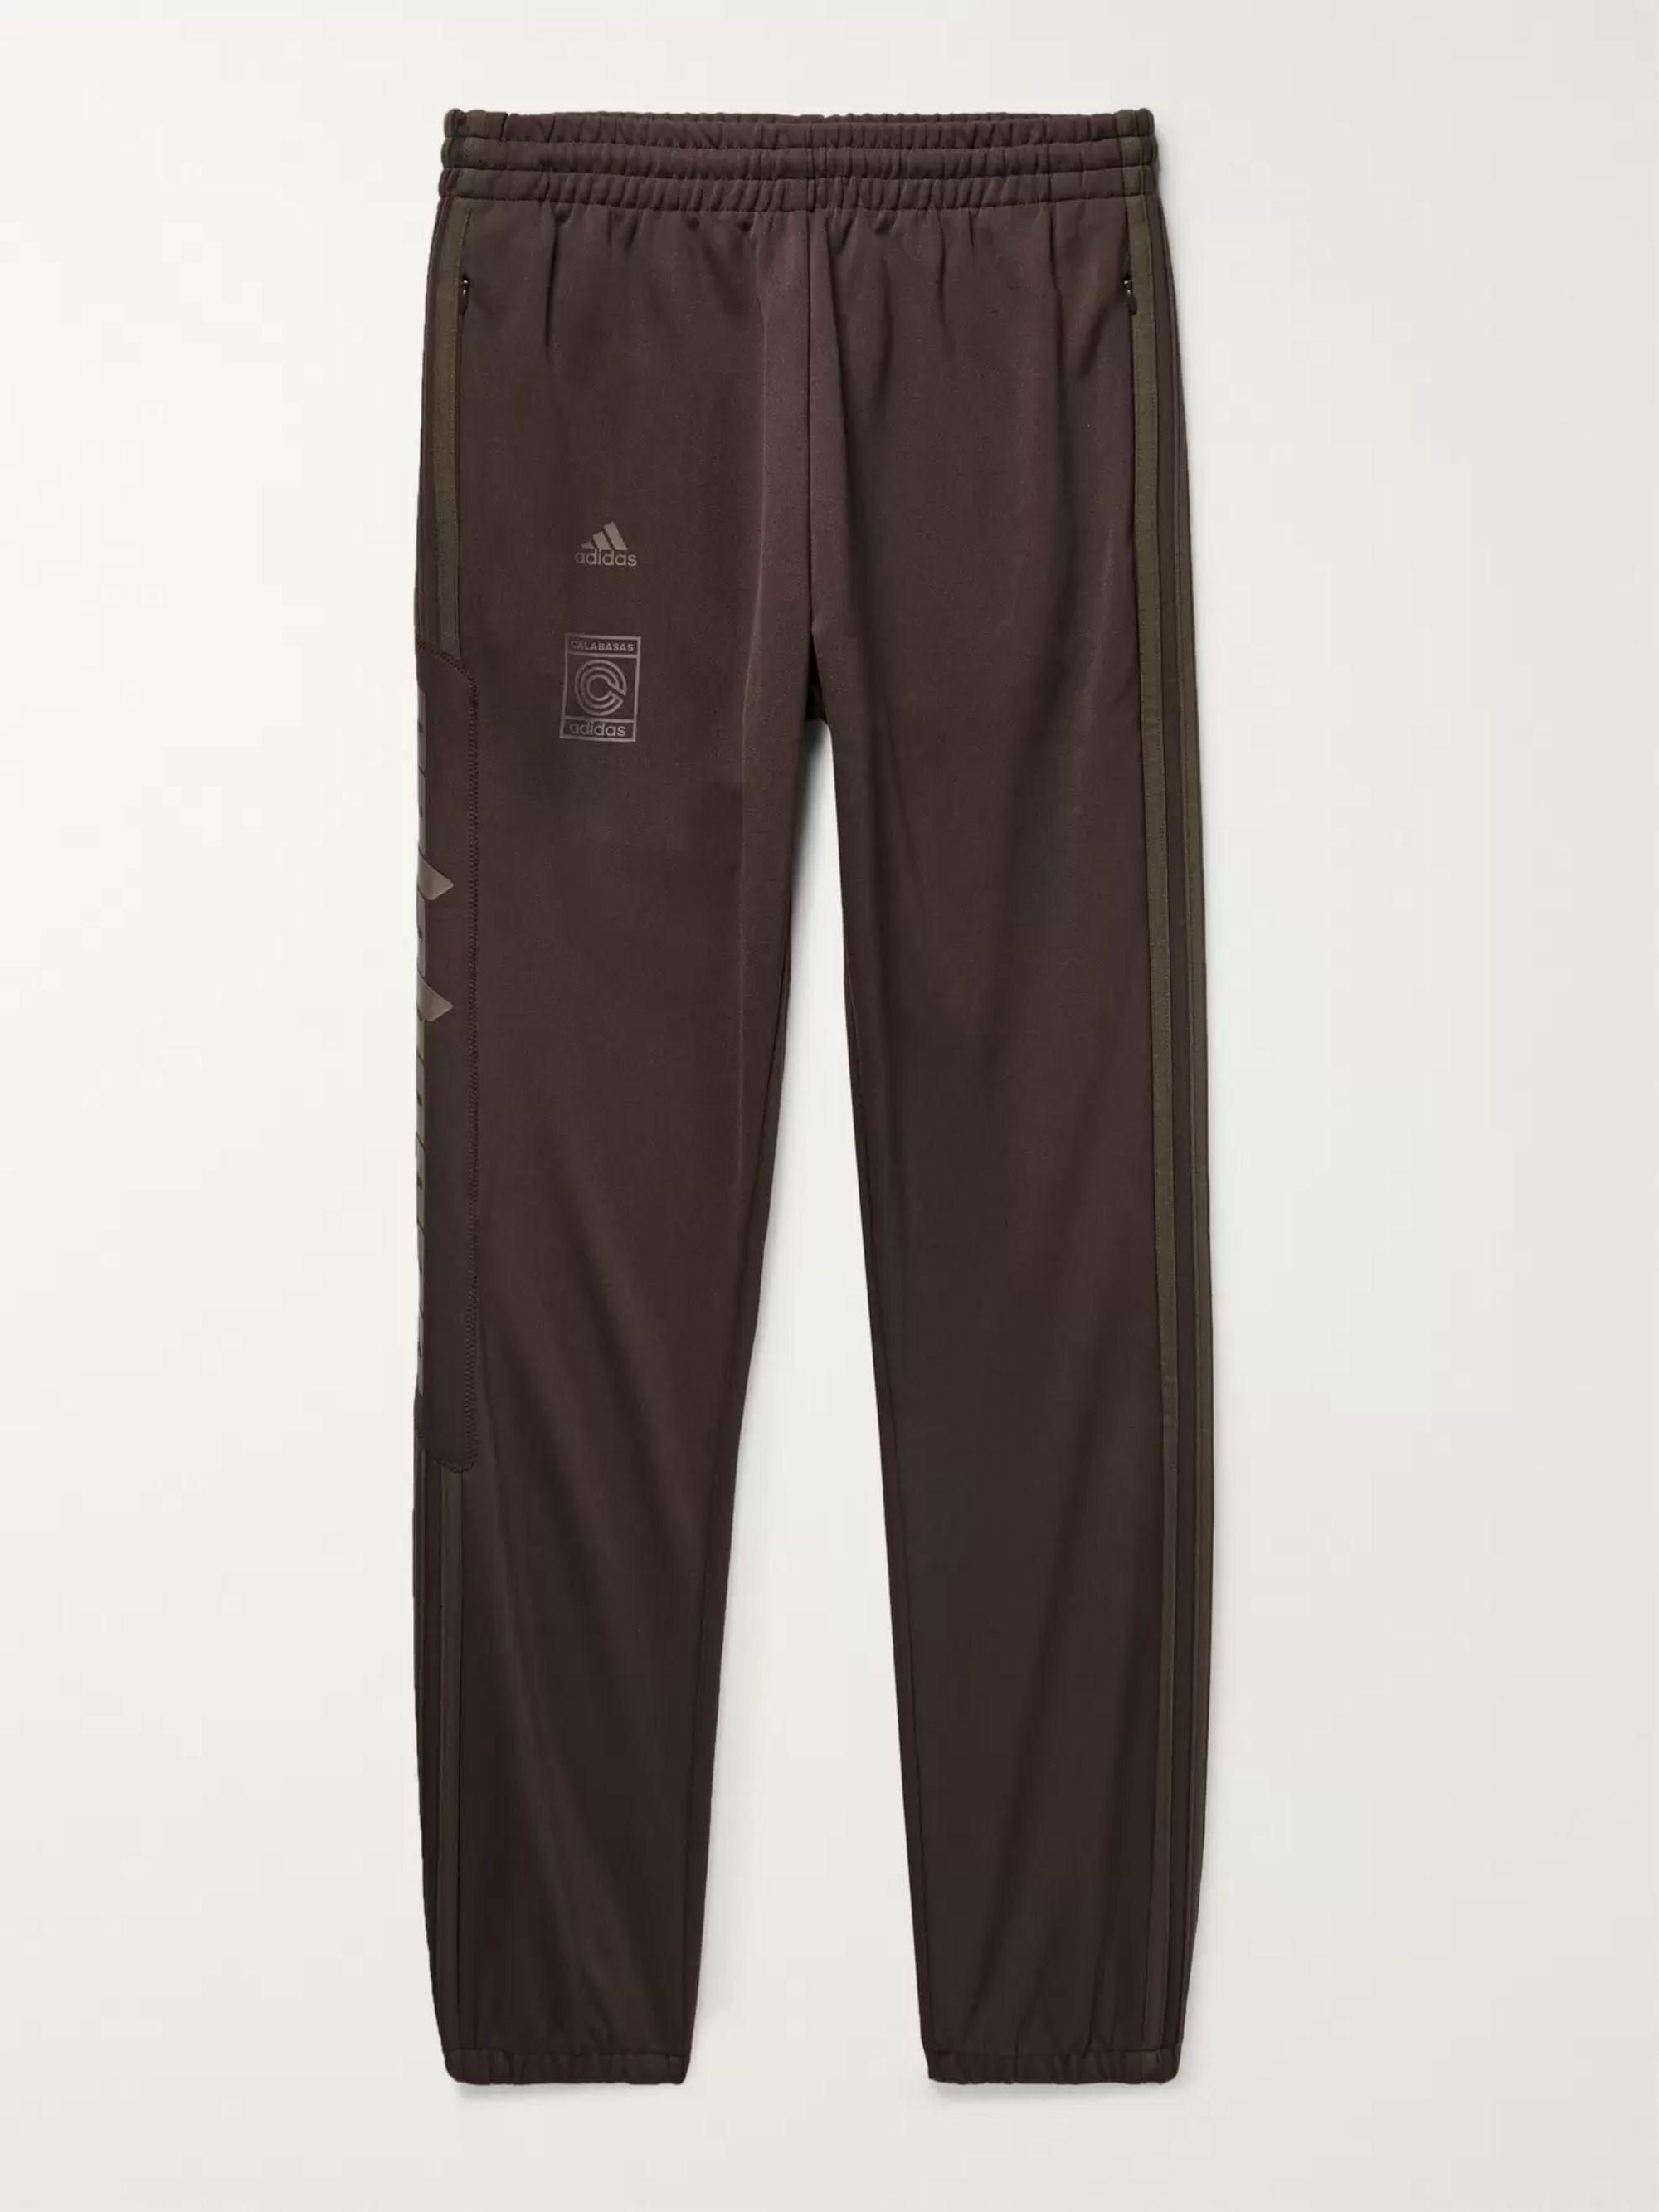 + Yeezy Calabasas Striped Jersey Sweatpants by Adidas Originals